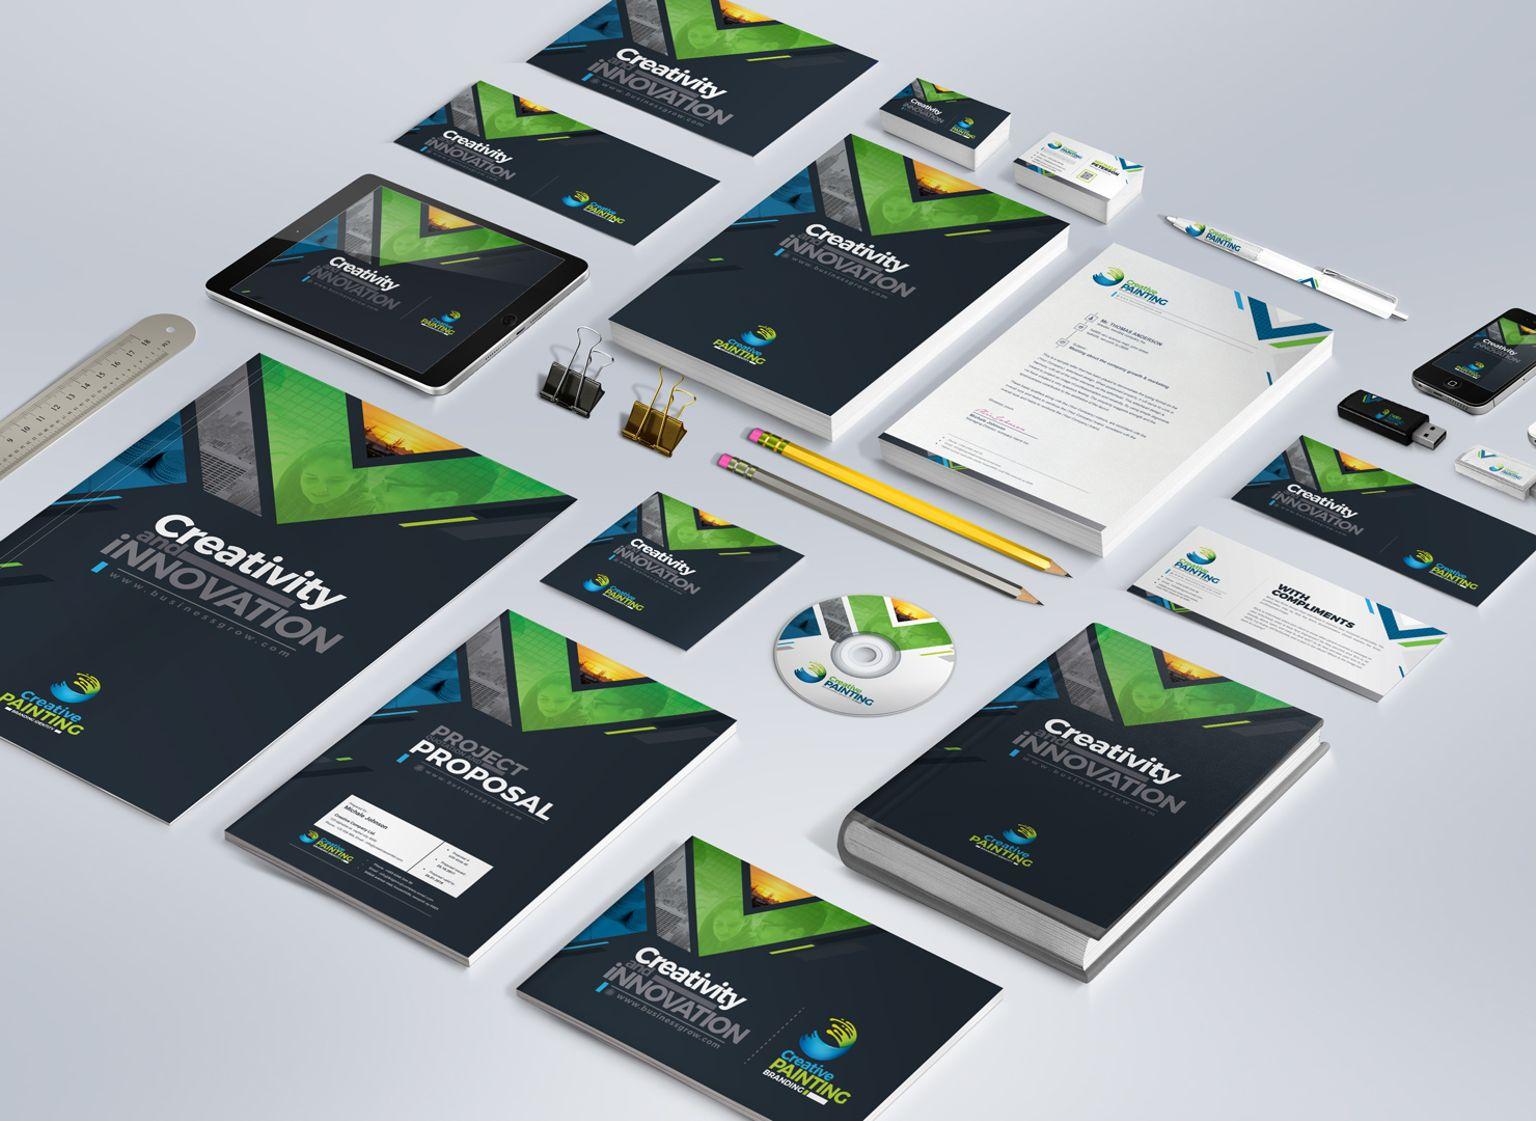 https://s3.tmimgcdn.com/templates/4053/scr/73_Corporate-creative-mega-business-branding-identity-design-template-download.jpg